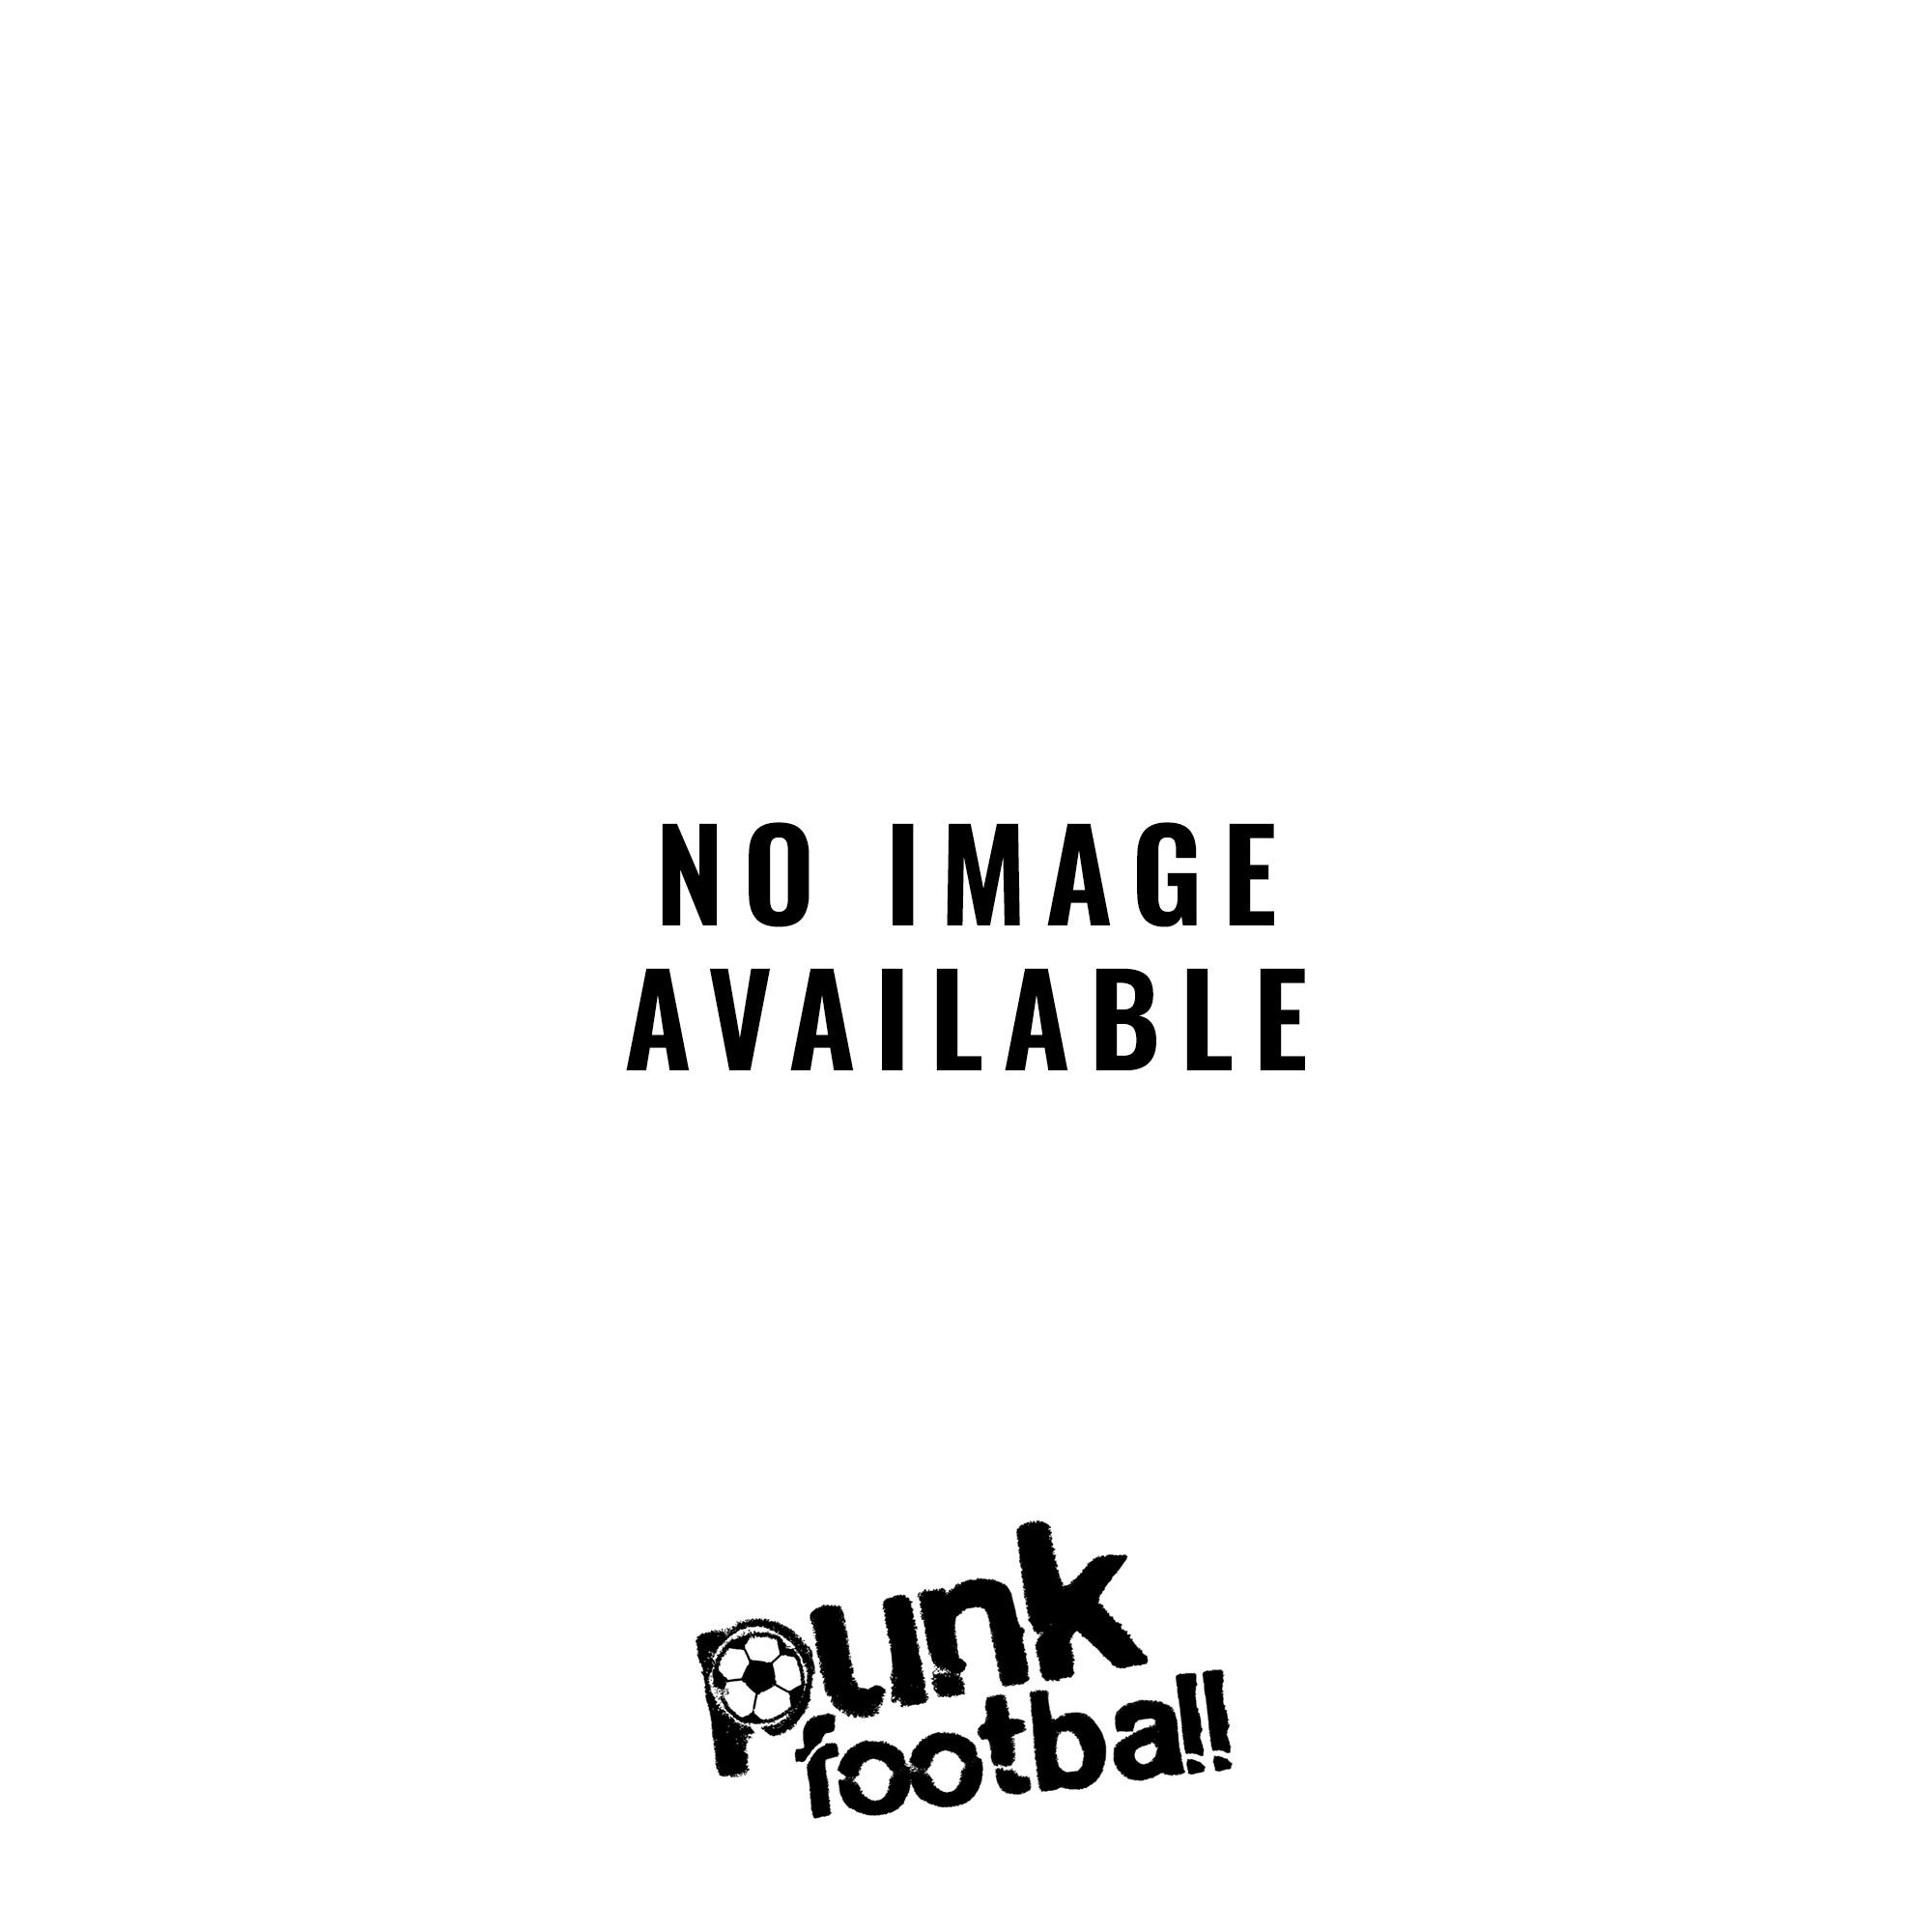 The North West (Bury) Hooded Sweatshirt